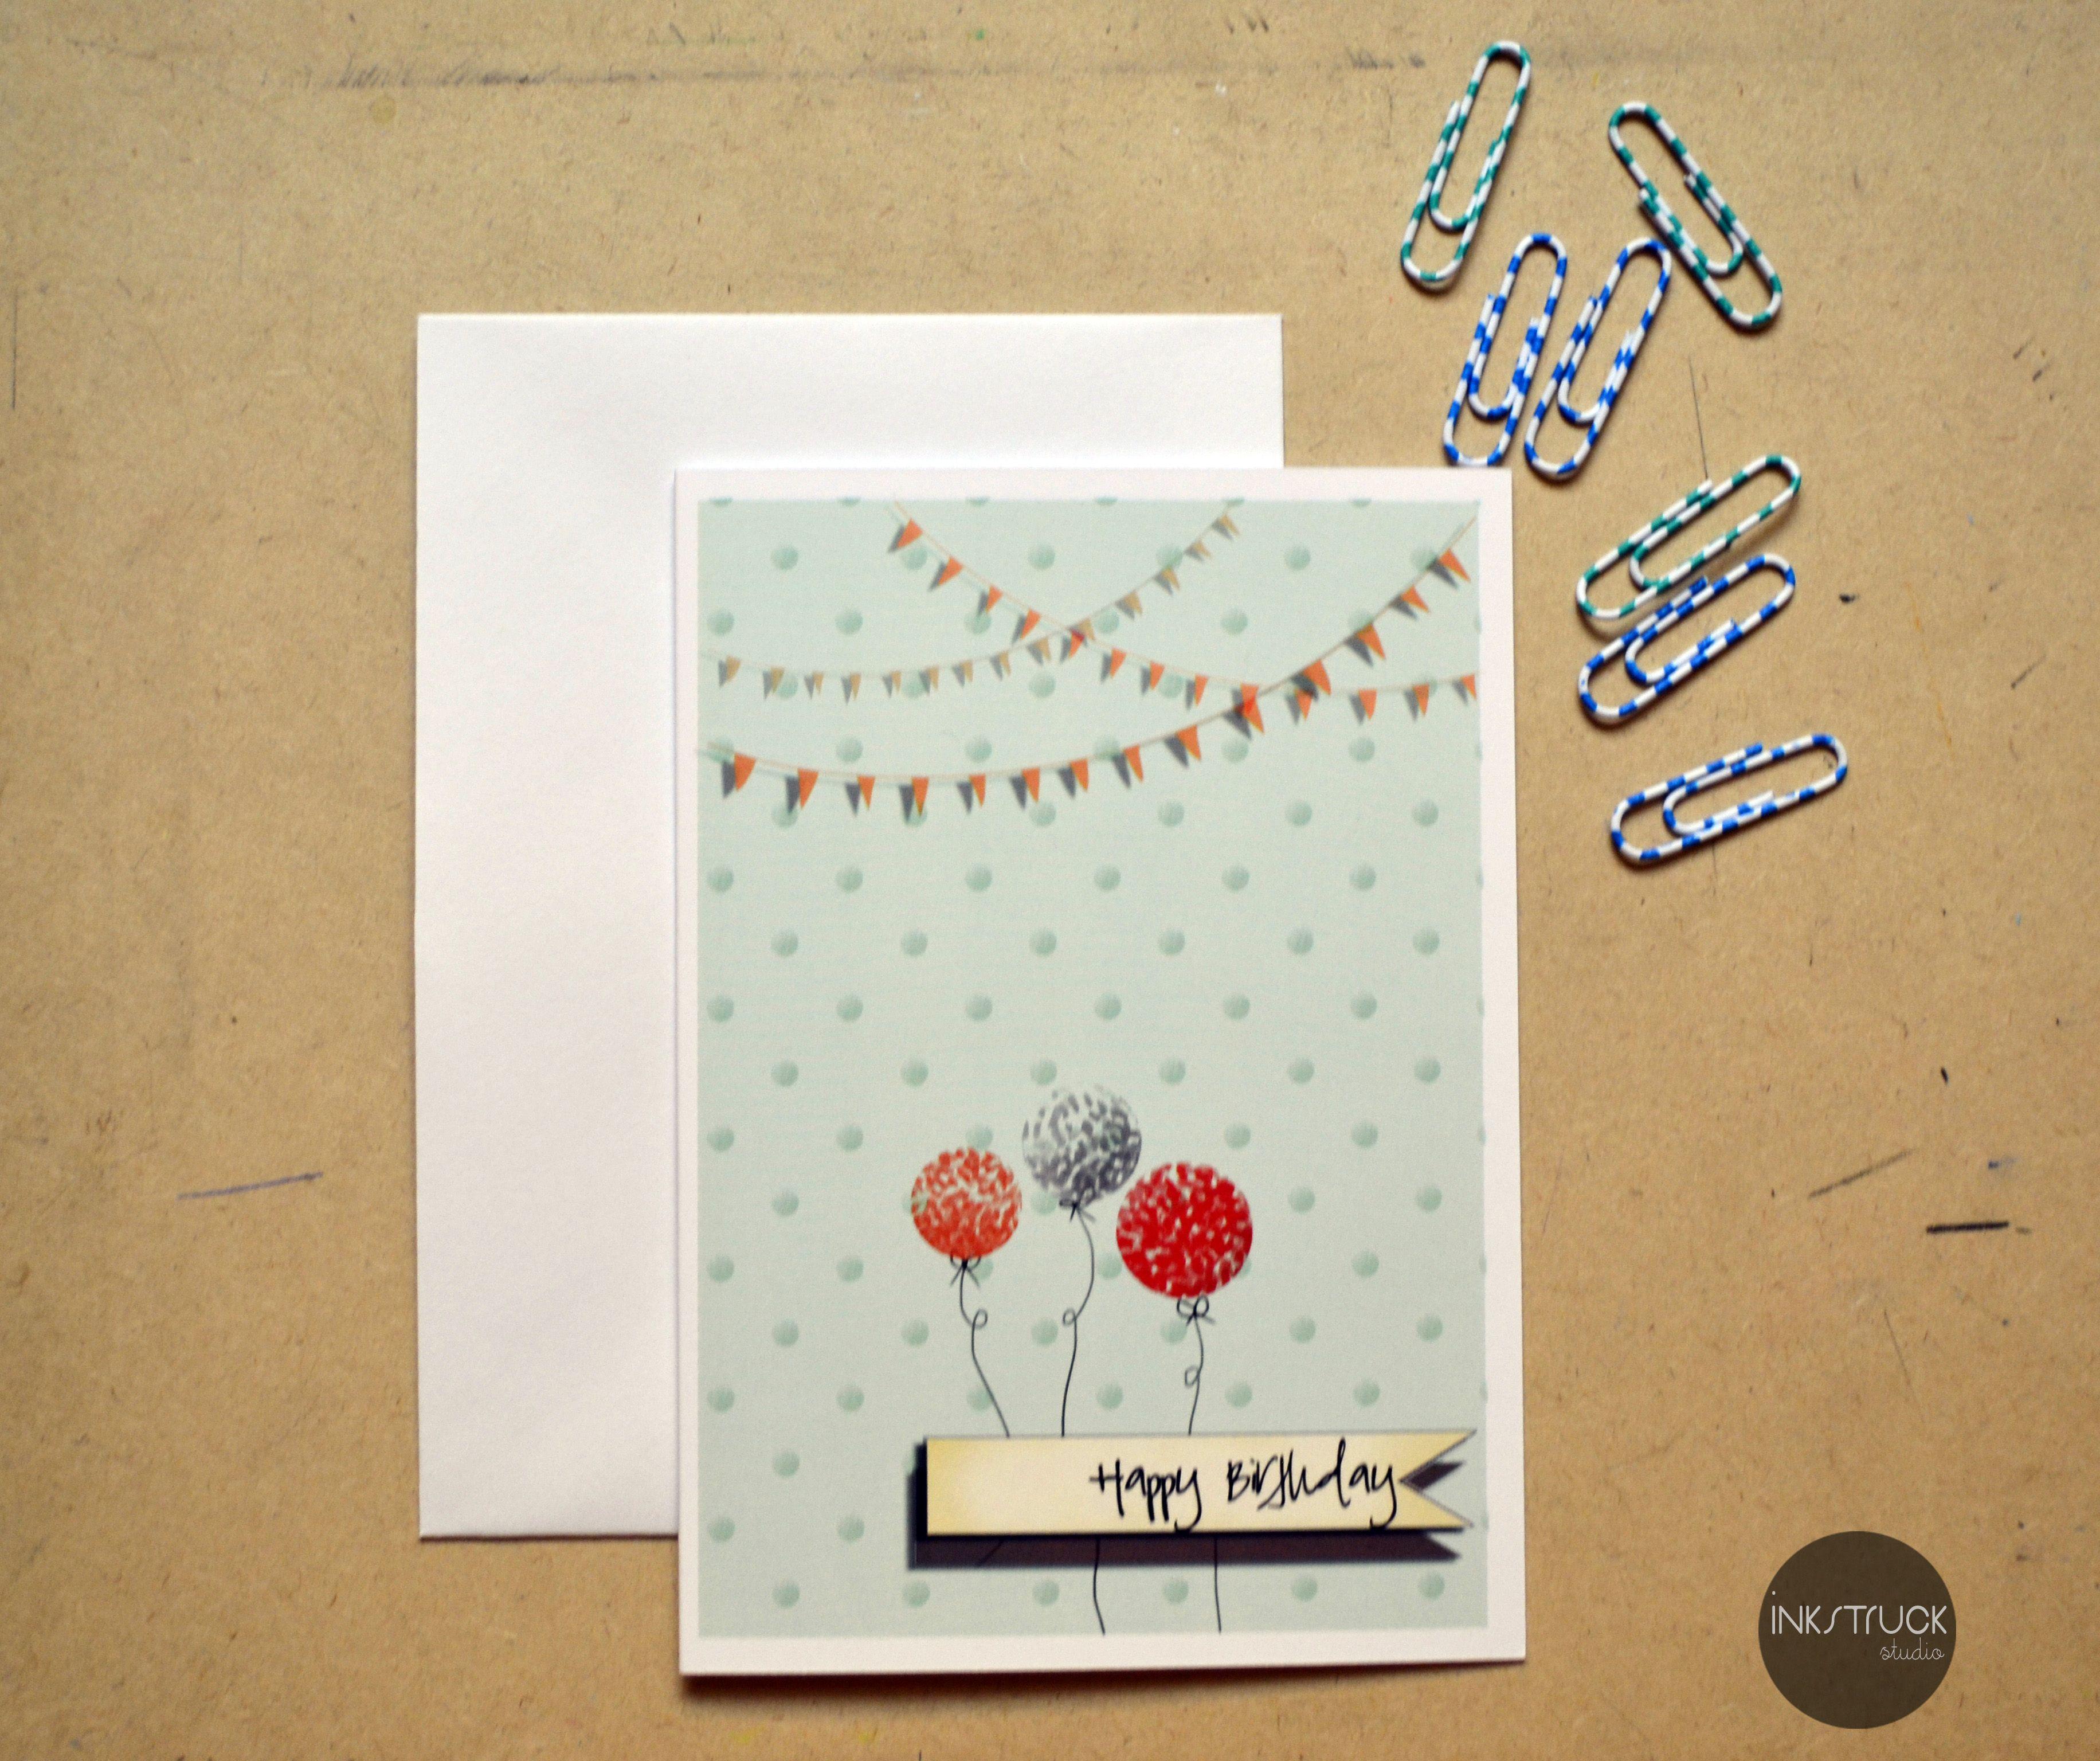 Balloon birthday card greeting card gc003 every birthday balloon birthday card greeting card gc003 every birthday kristyandbryce Image collections